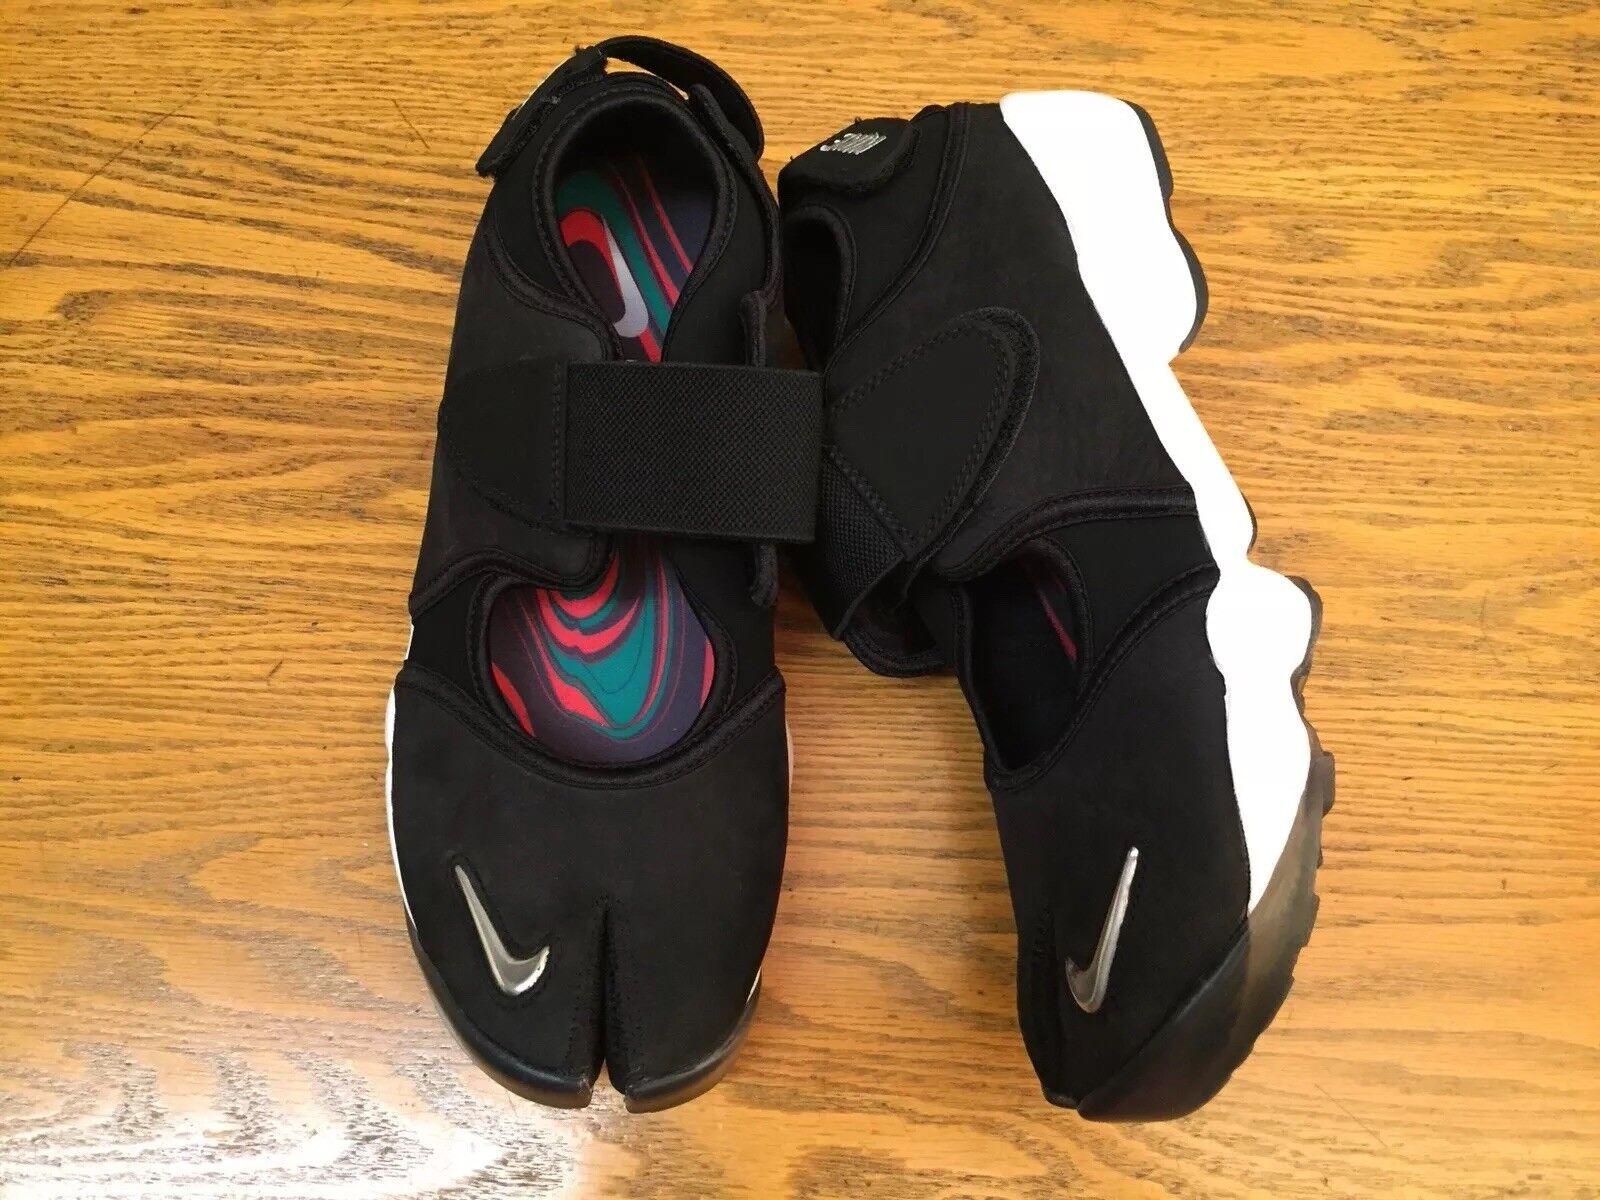 Nike mens air rifr jahrestag - mens Nike sportschuhe 861532-001 neue größe 11. 2bb1c4